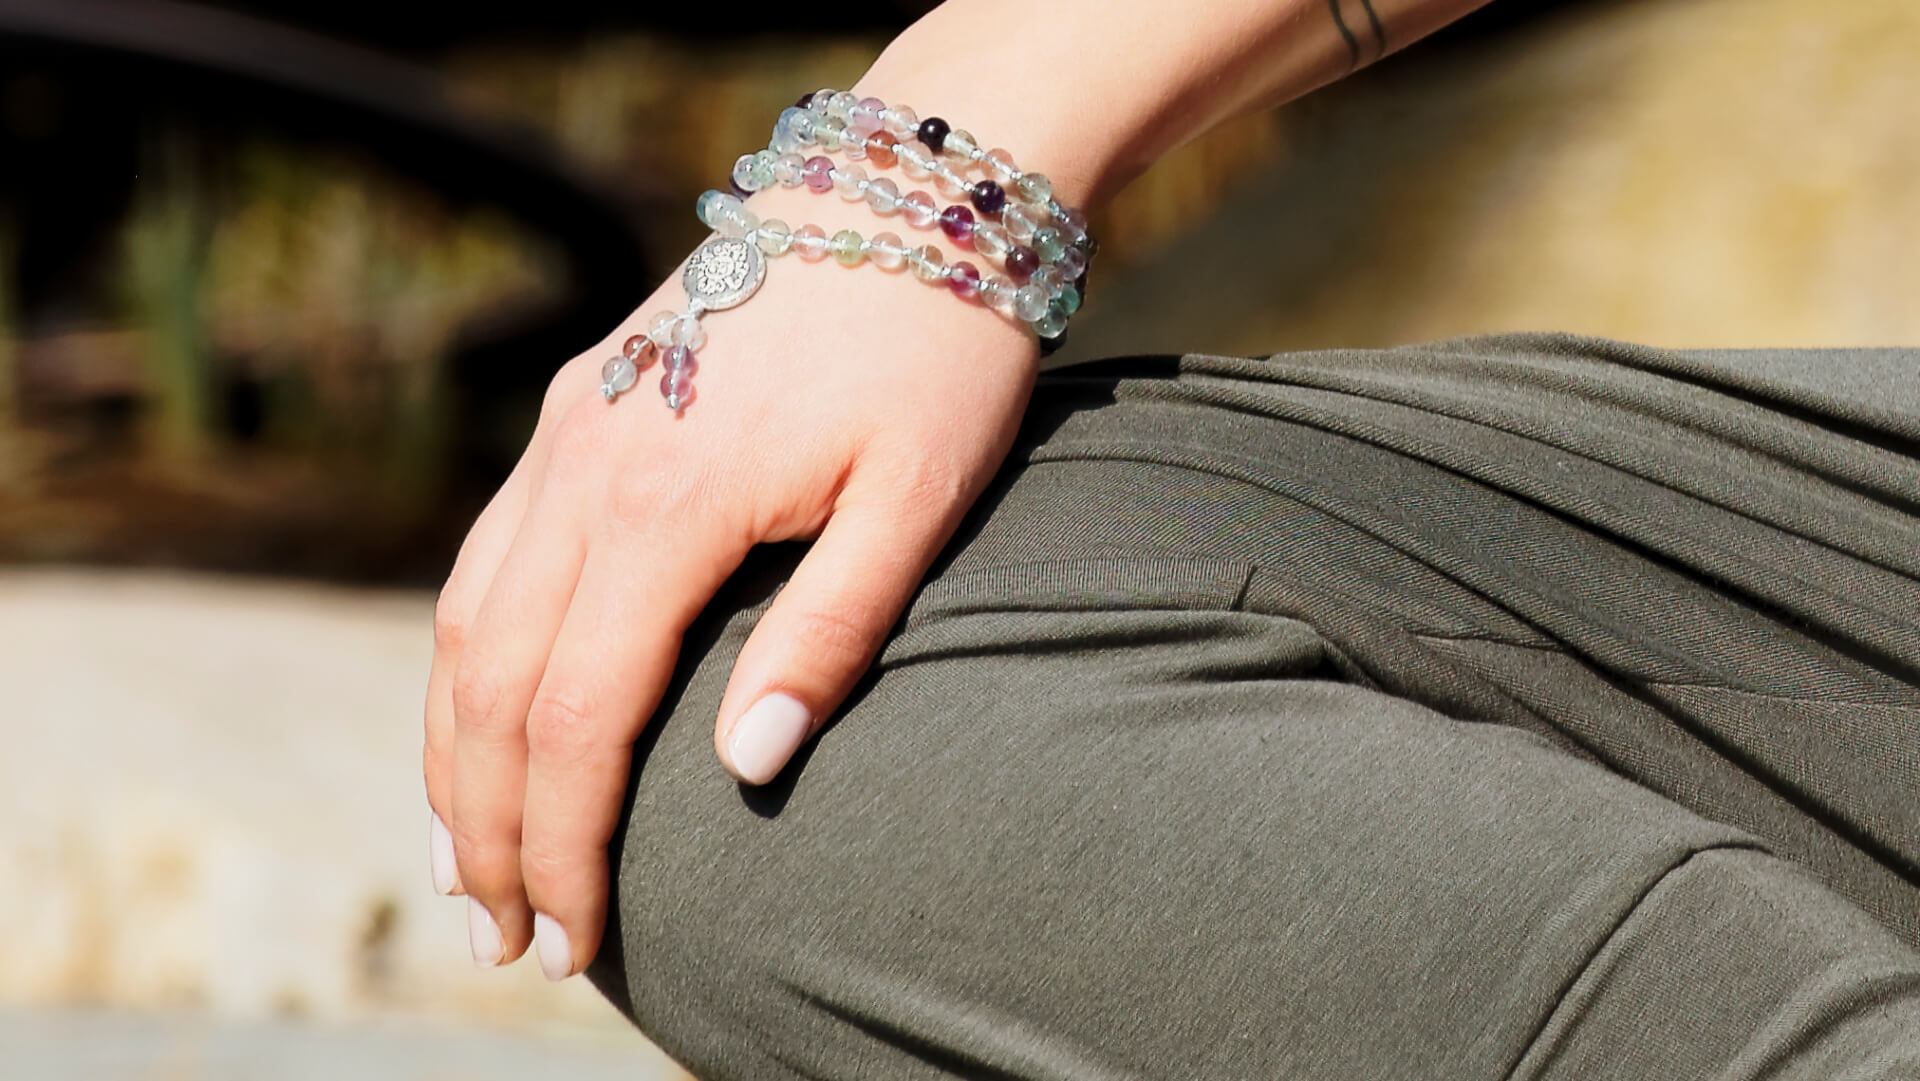 Mala Fluorit getragen am Handgelenk